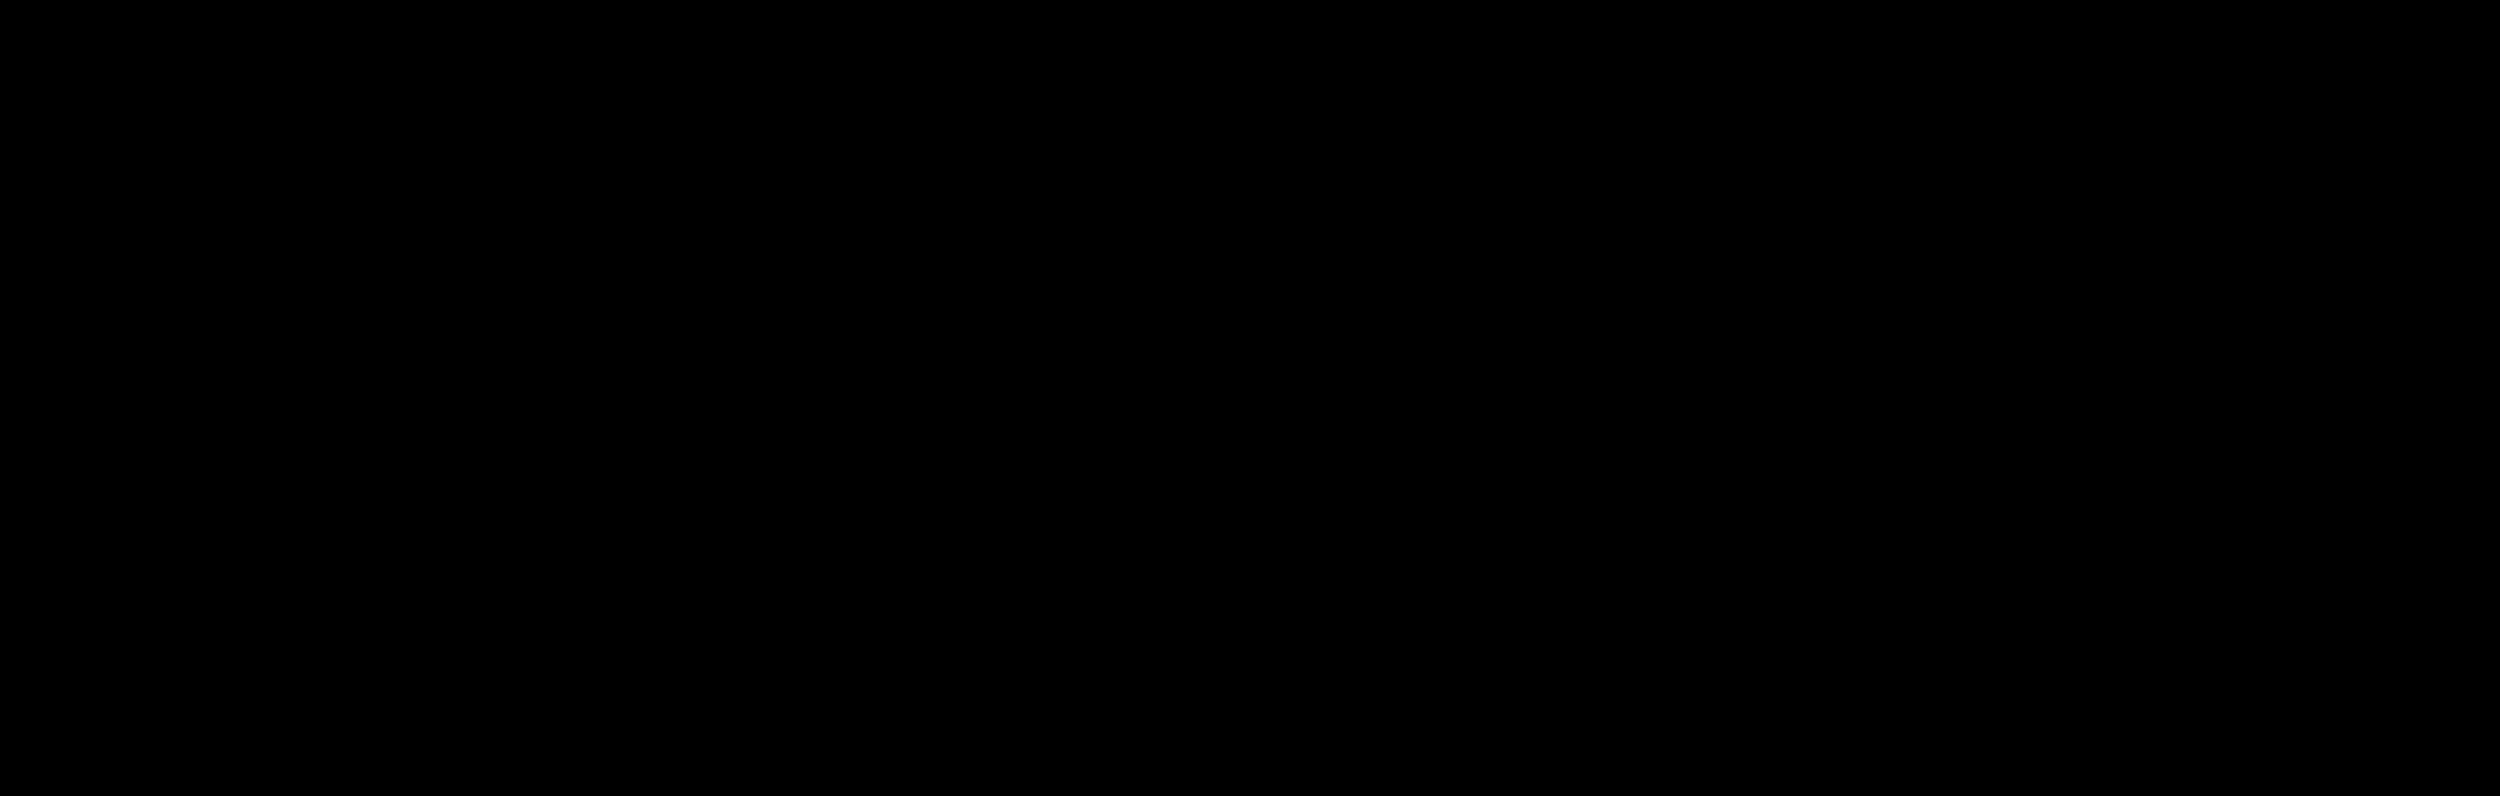 ubisoft-logo-1.png